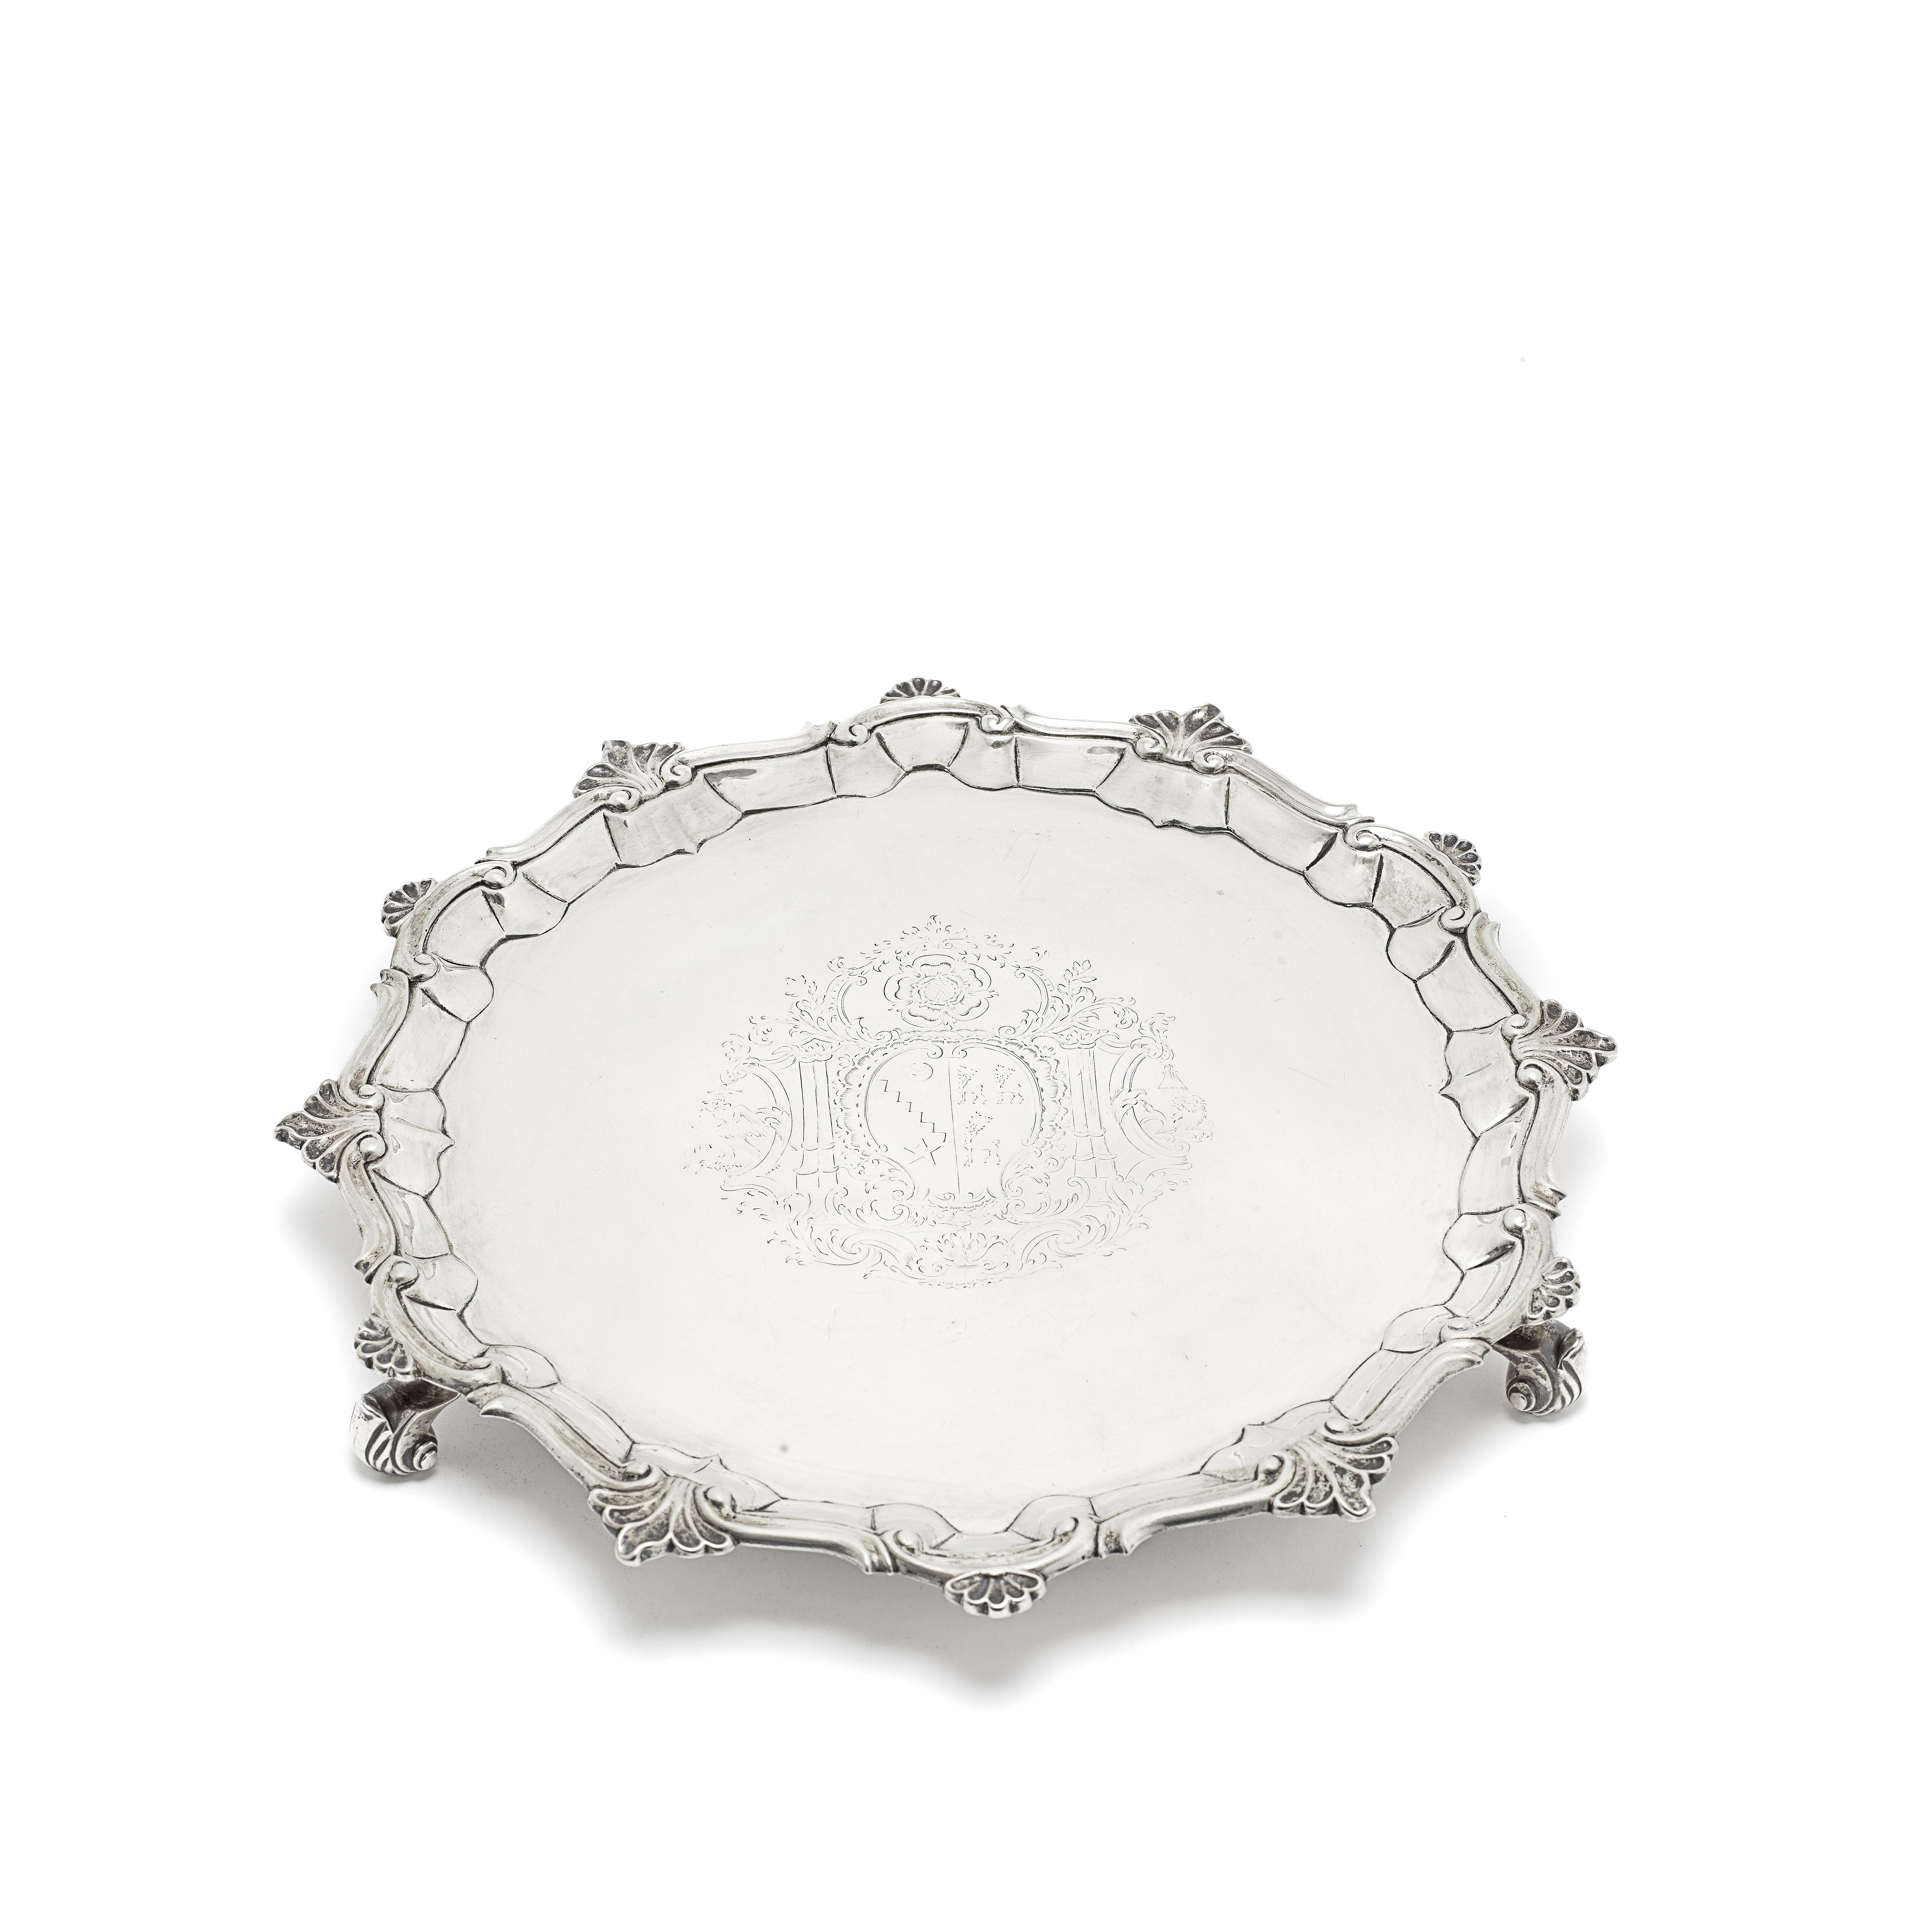 A George II silver salver William Peaston, London 1752